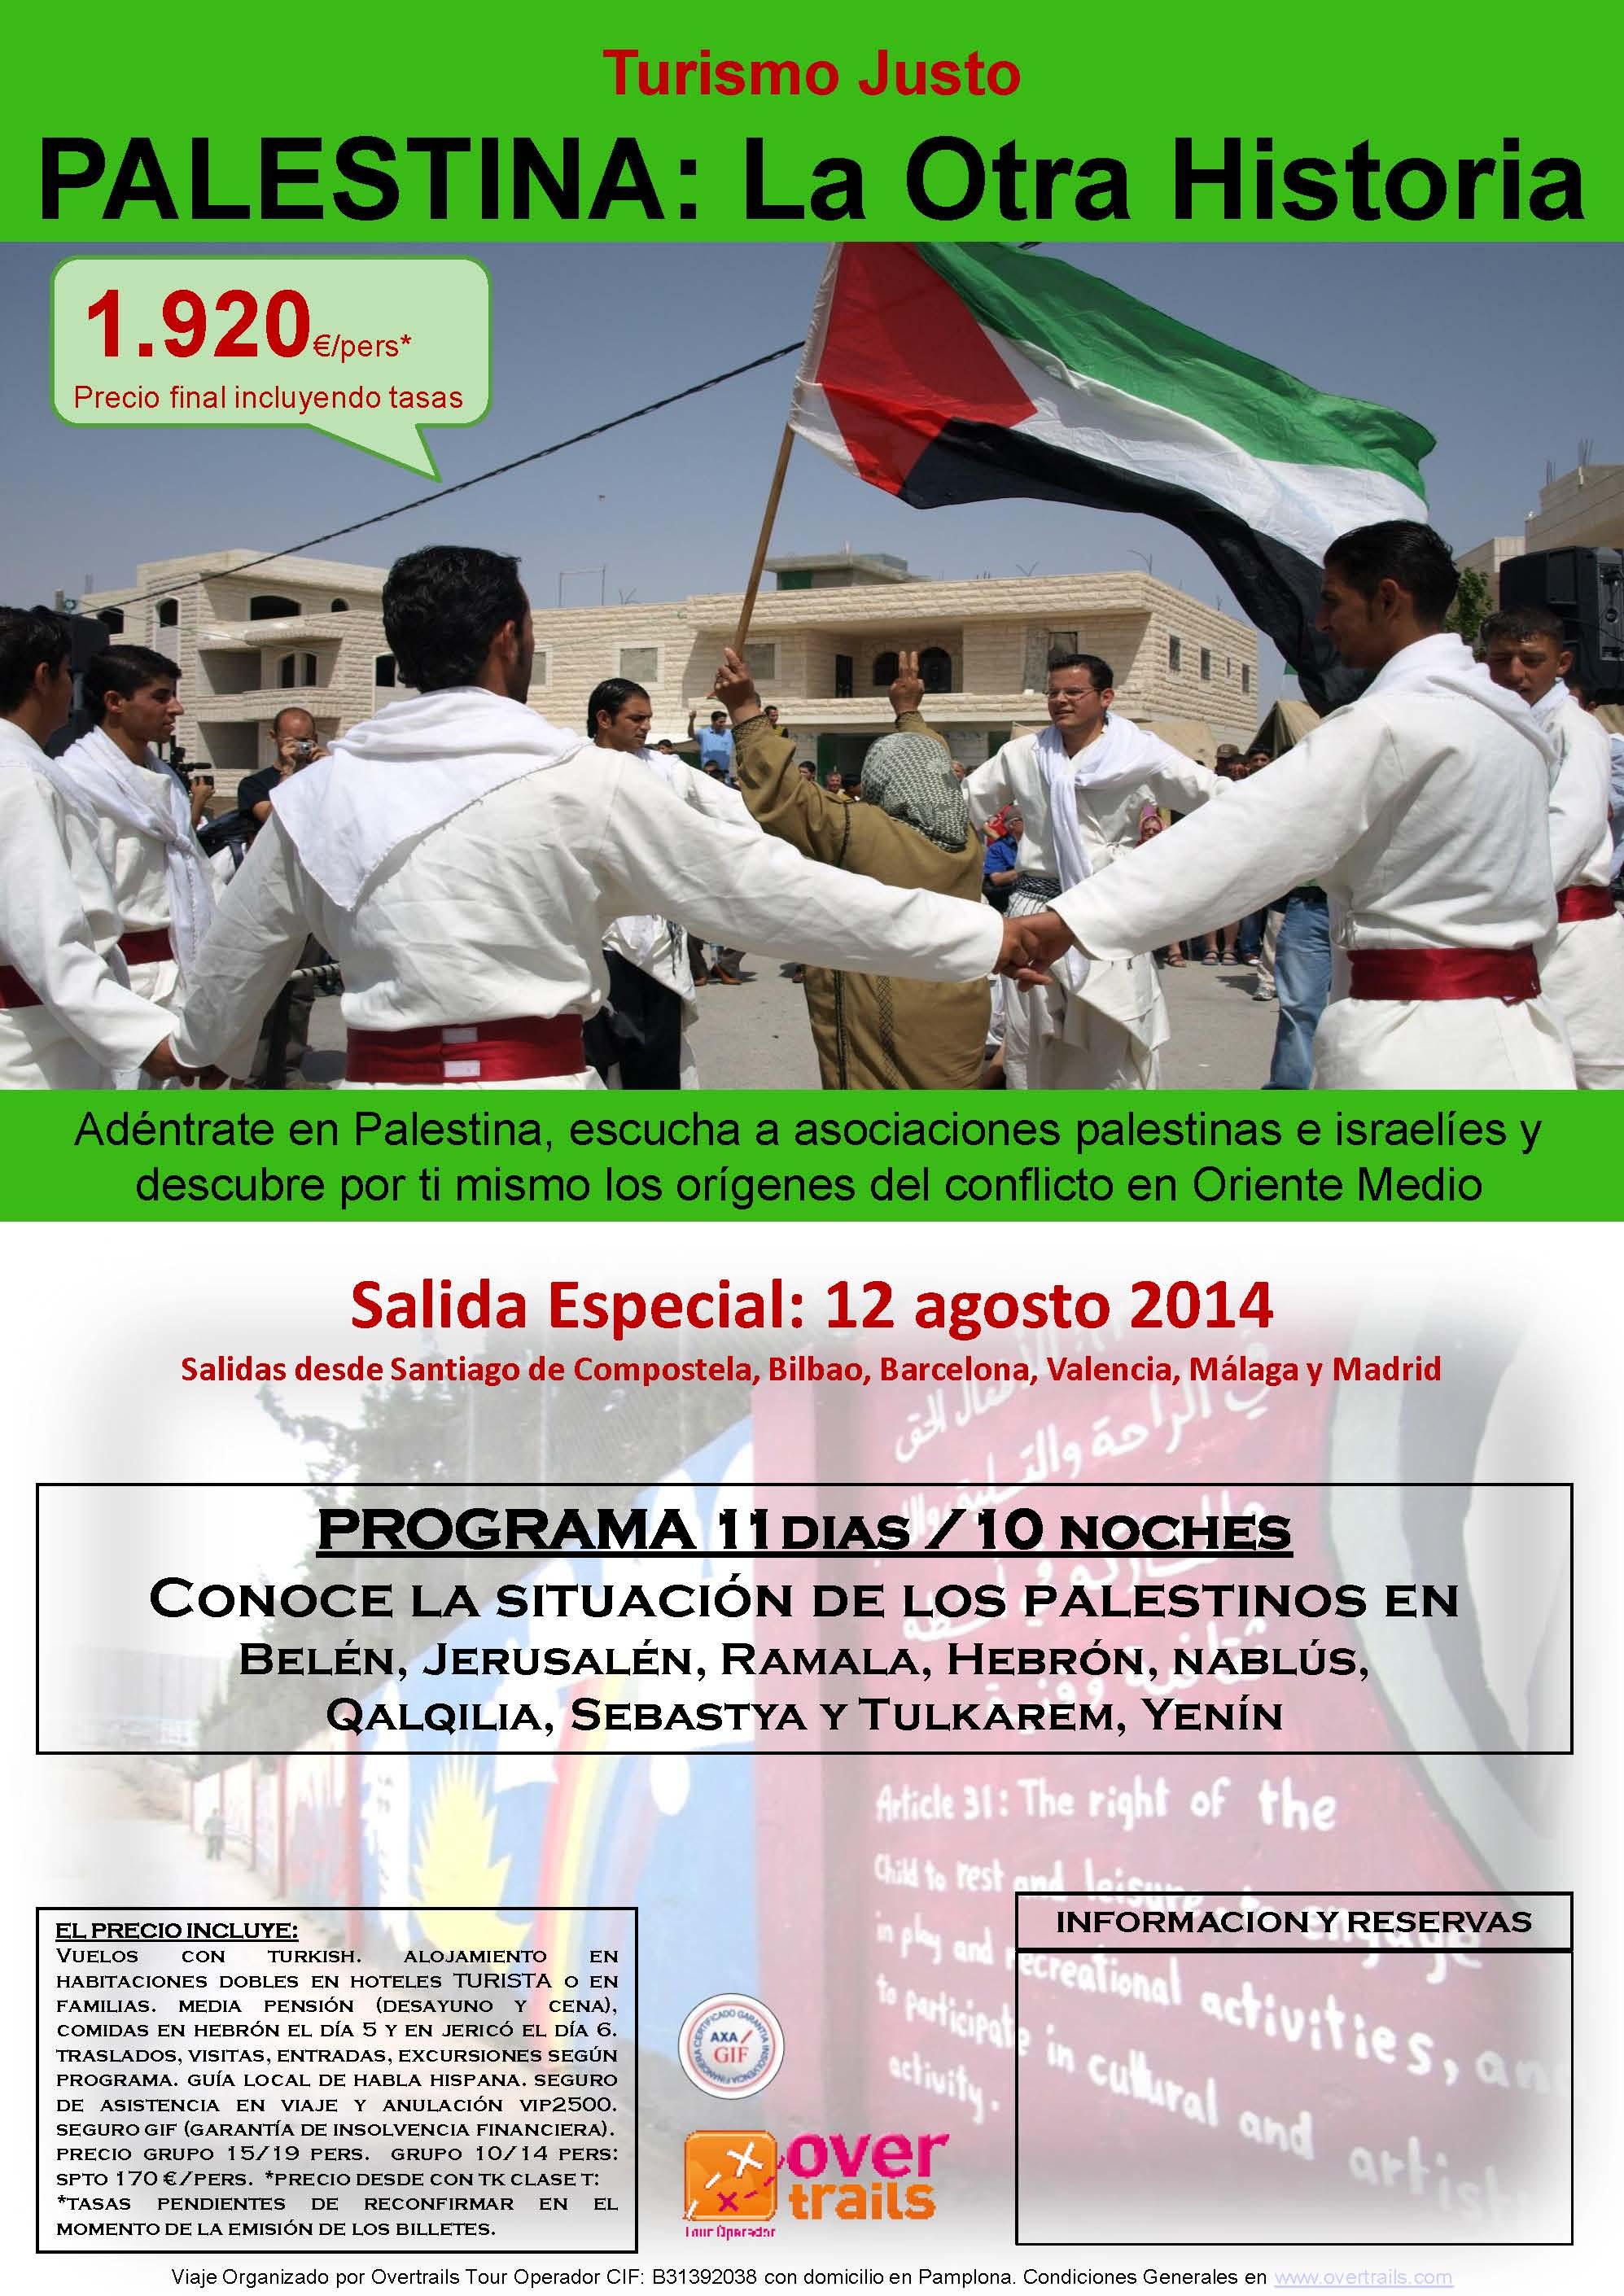 PALESTINA LA OTRA HISTORIA II 12 agosto 2014 jpg